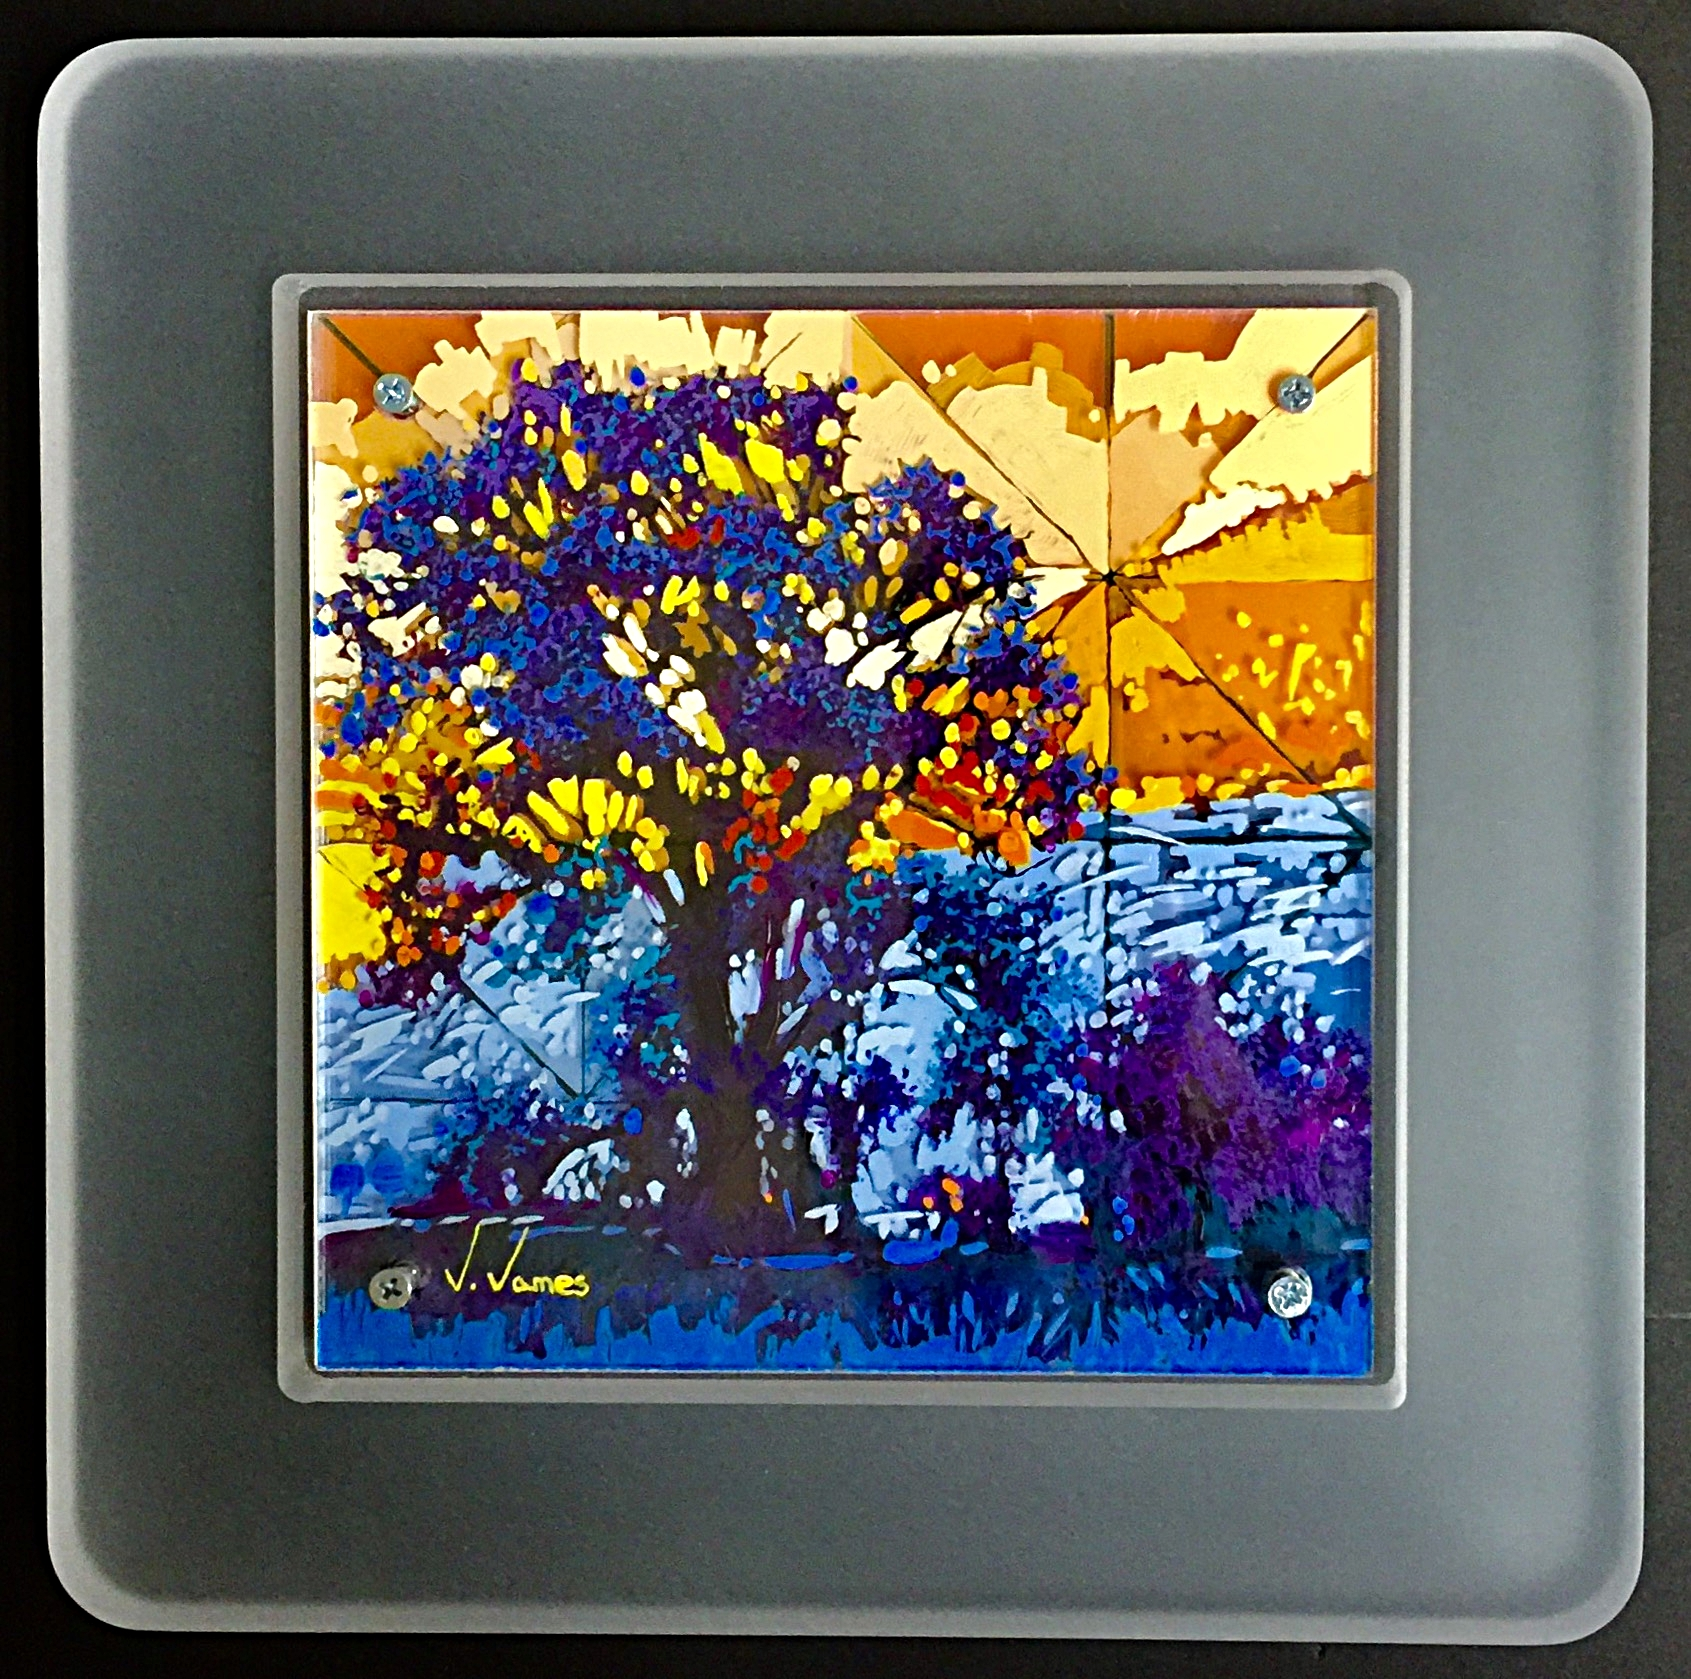 "Where The Fish Run, 8"" x 8"" Acrylic on Multi-Layered Acrylic Glass"